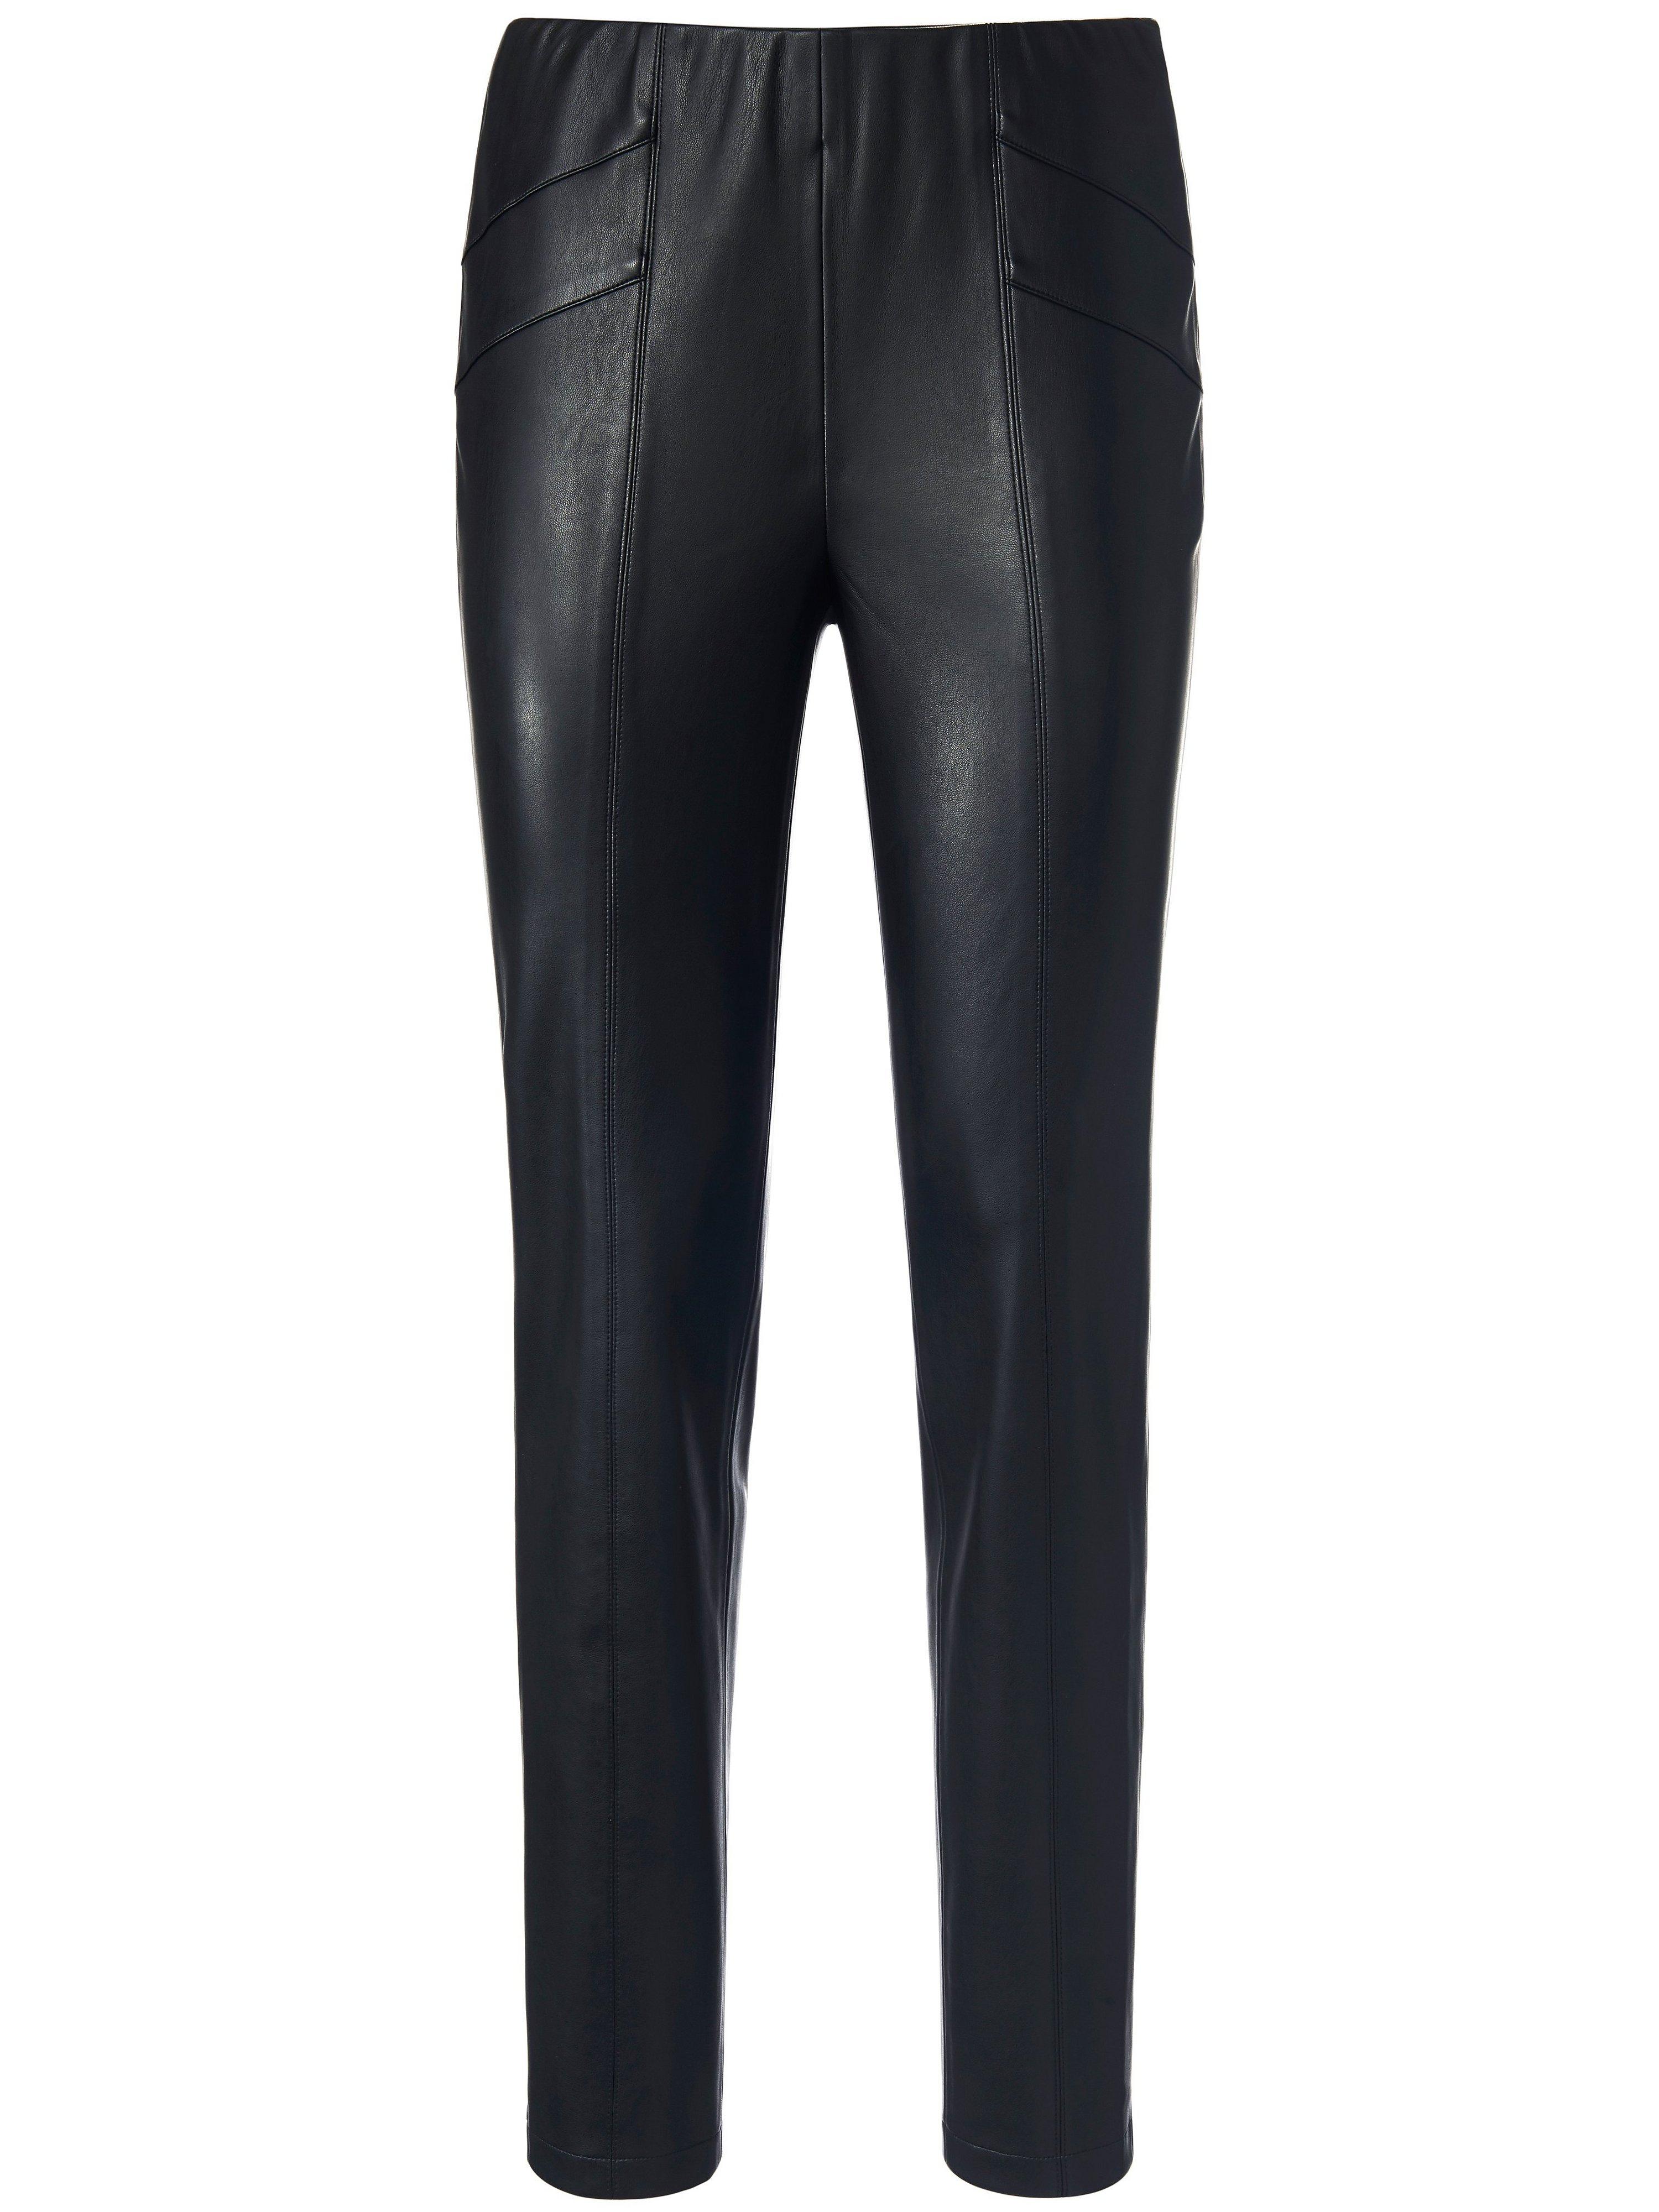 Legging elastisch imitatieleer Van Laura Biagiotti ROMA zwart